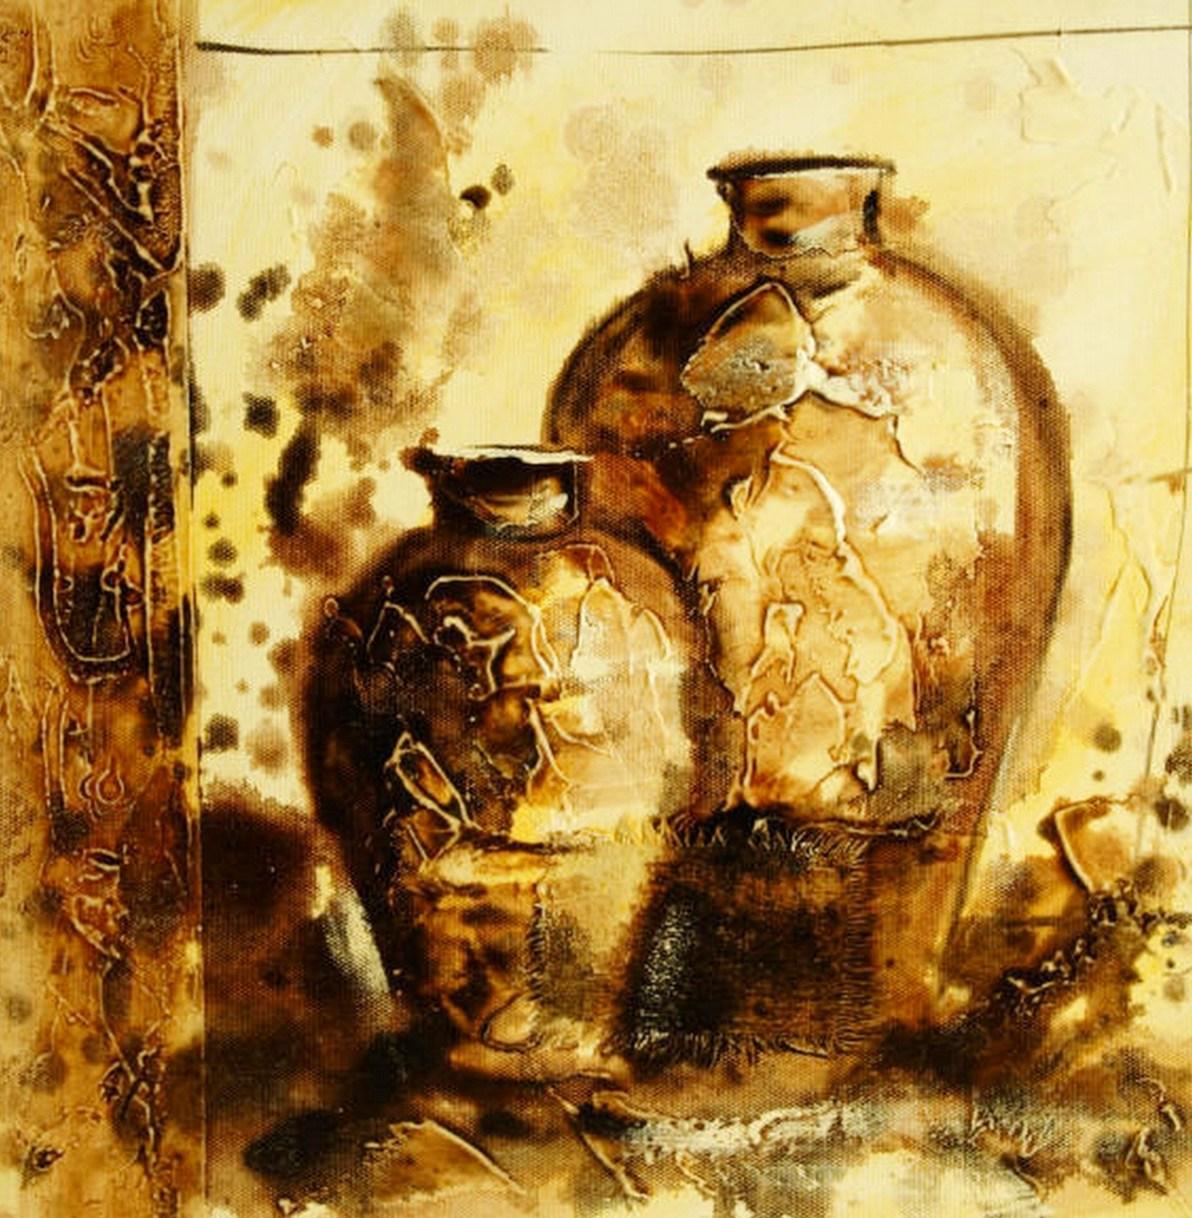 Im genes arte pinturas bodegones abstractos - Pinturas bodegones modernos ...